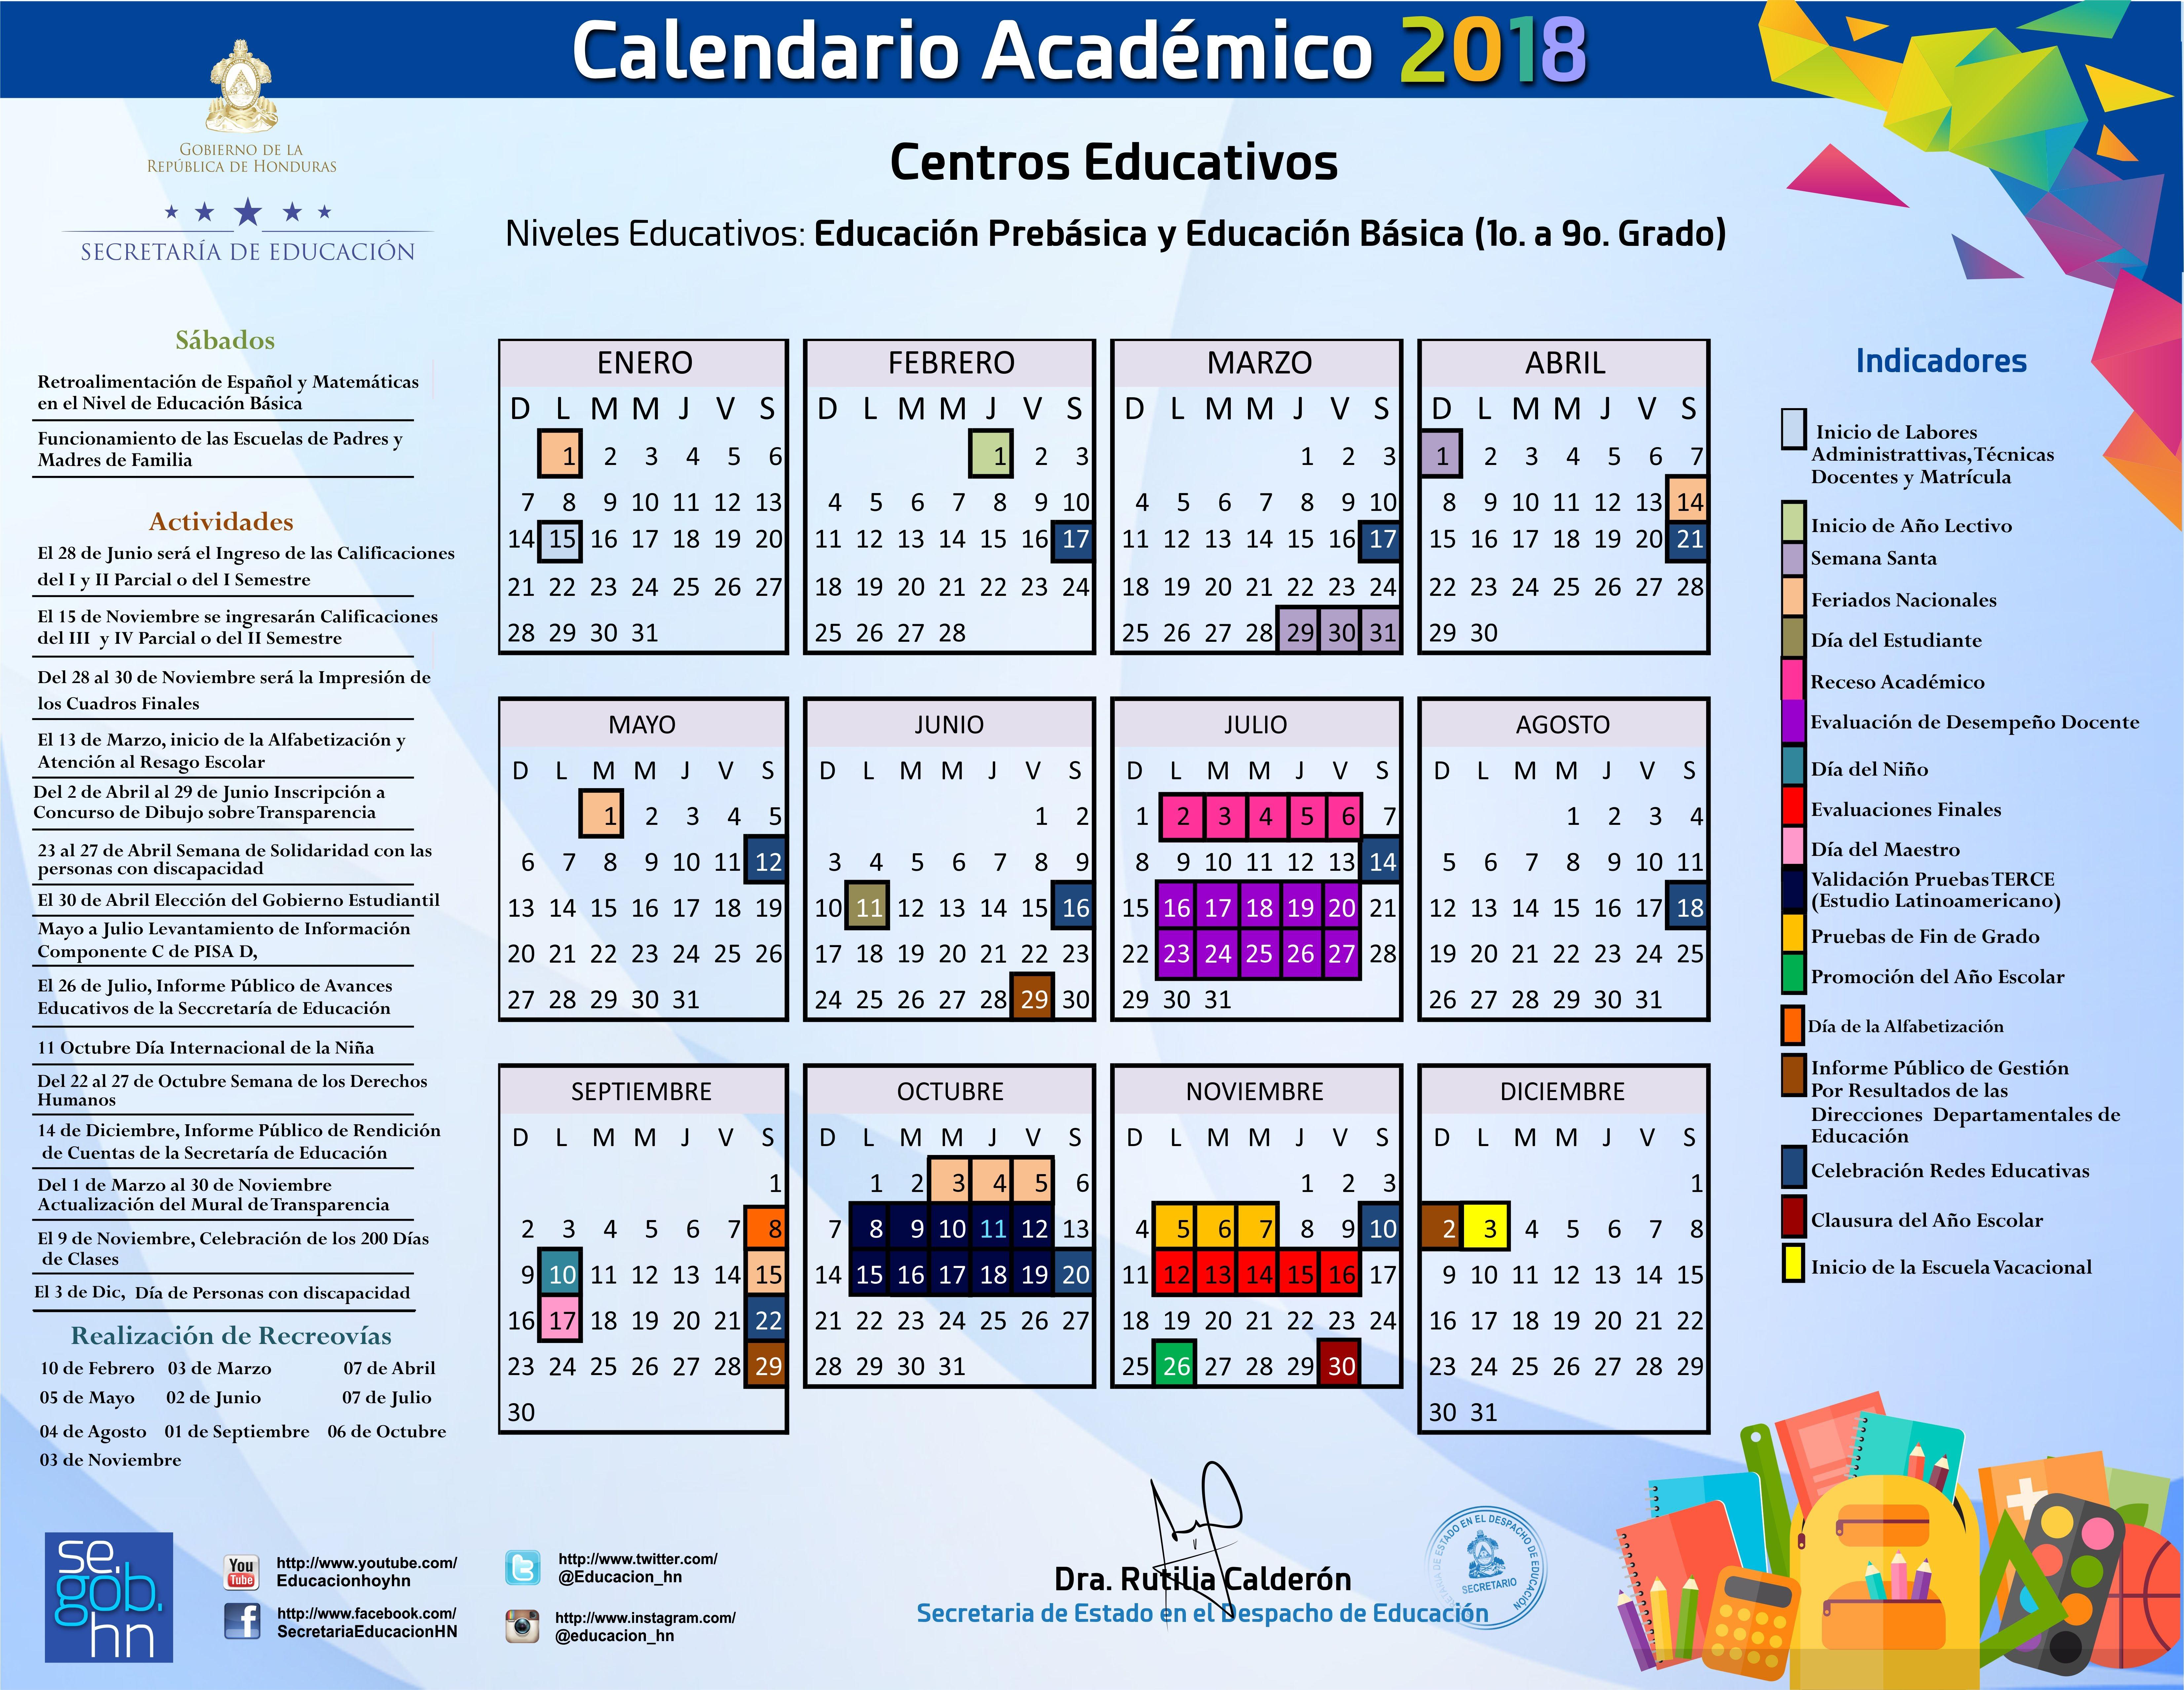 Calendario Escolar 2019 Imprimir Más Populares Se Of Calendario Escolar 2019 Imprimir Actual Calendario 7 Julio ☼ Calendario 2016 ☺ Pinterest